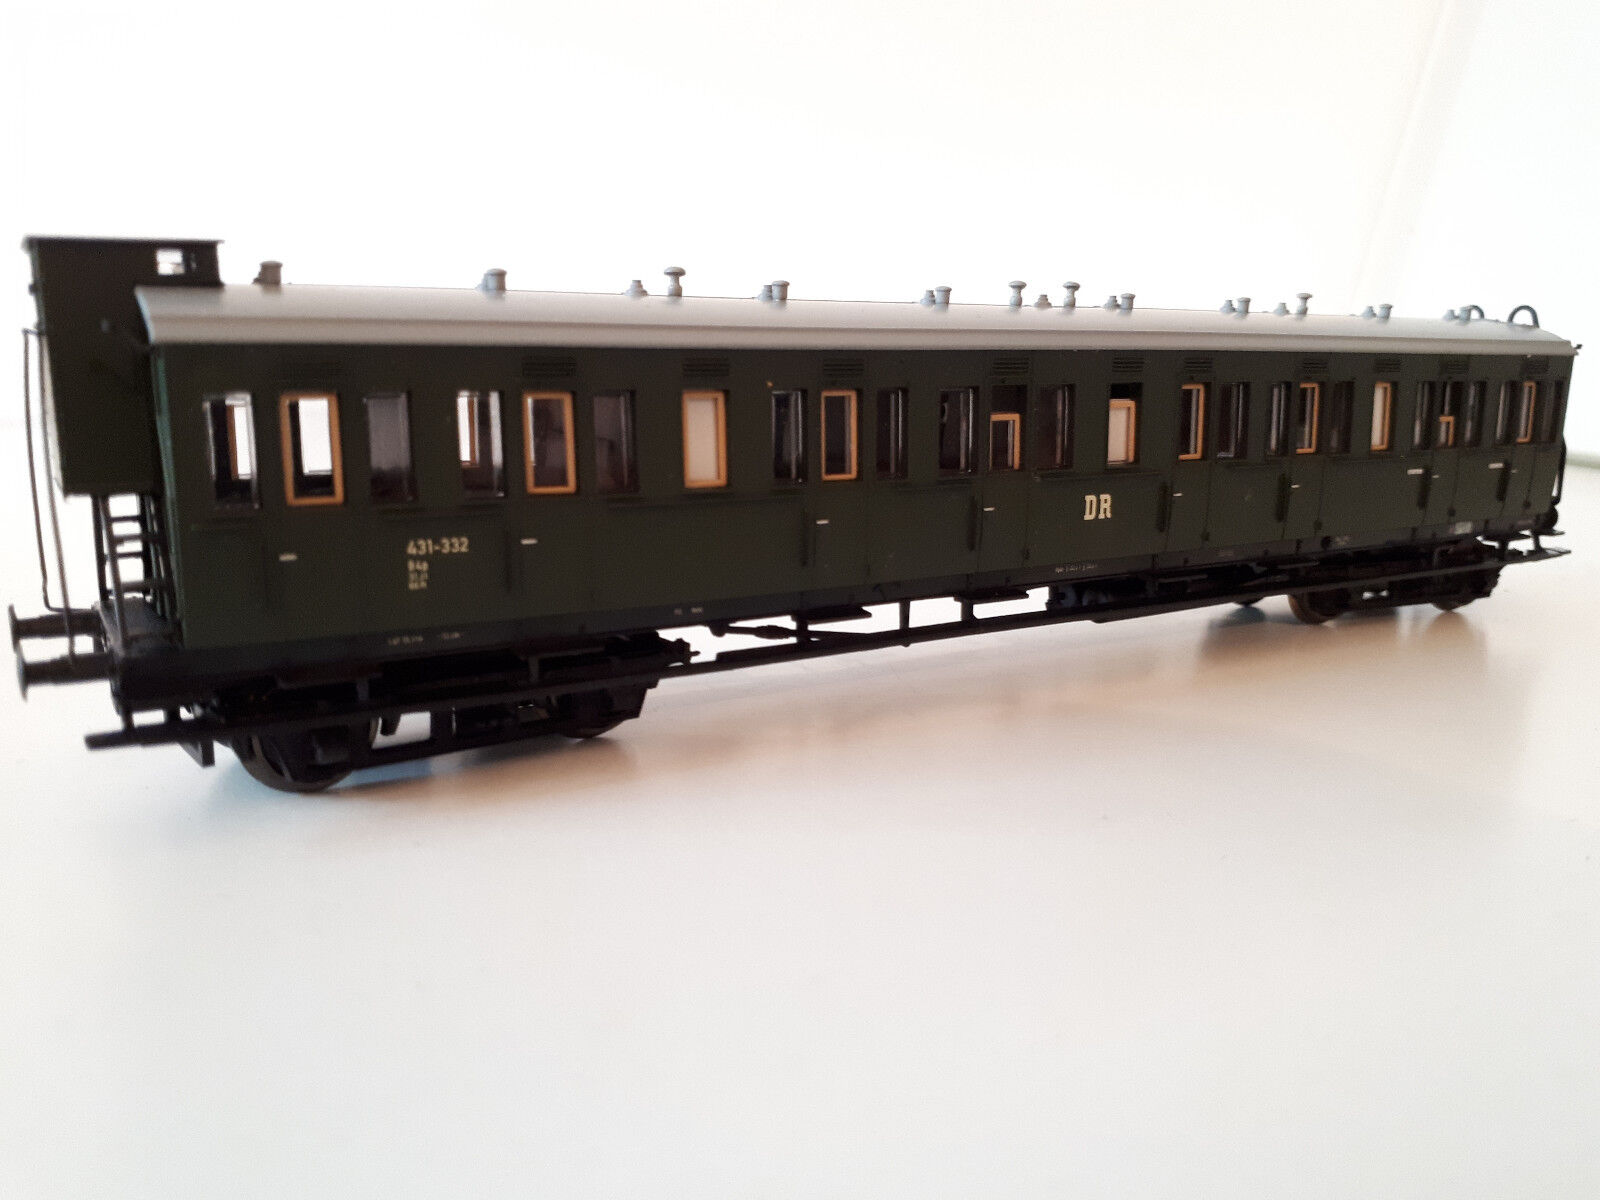 PIKO h0 vagoni DR DDR 431-332